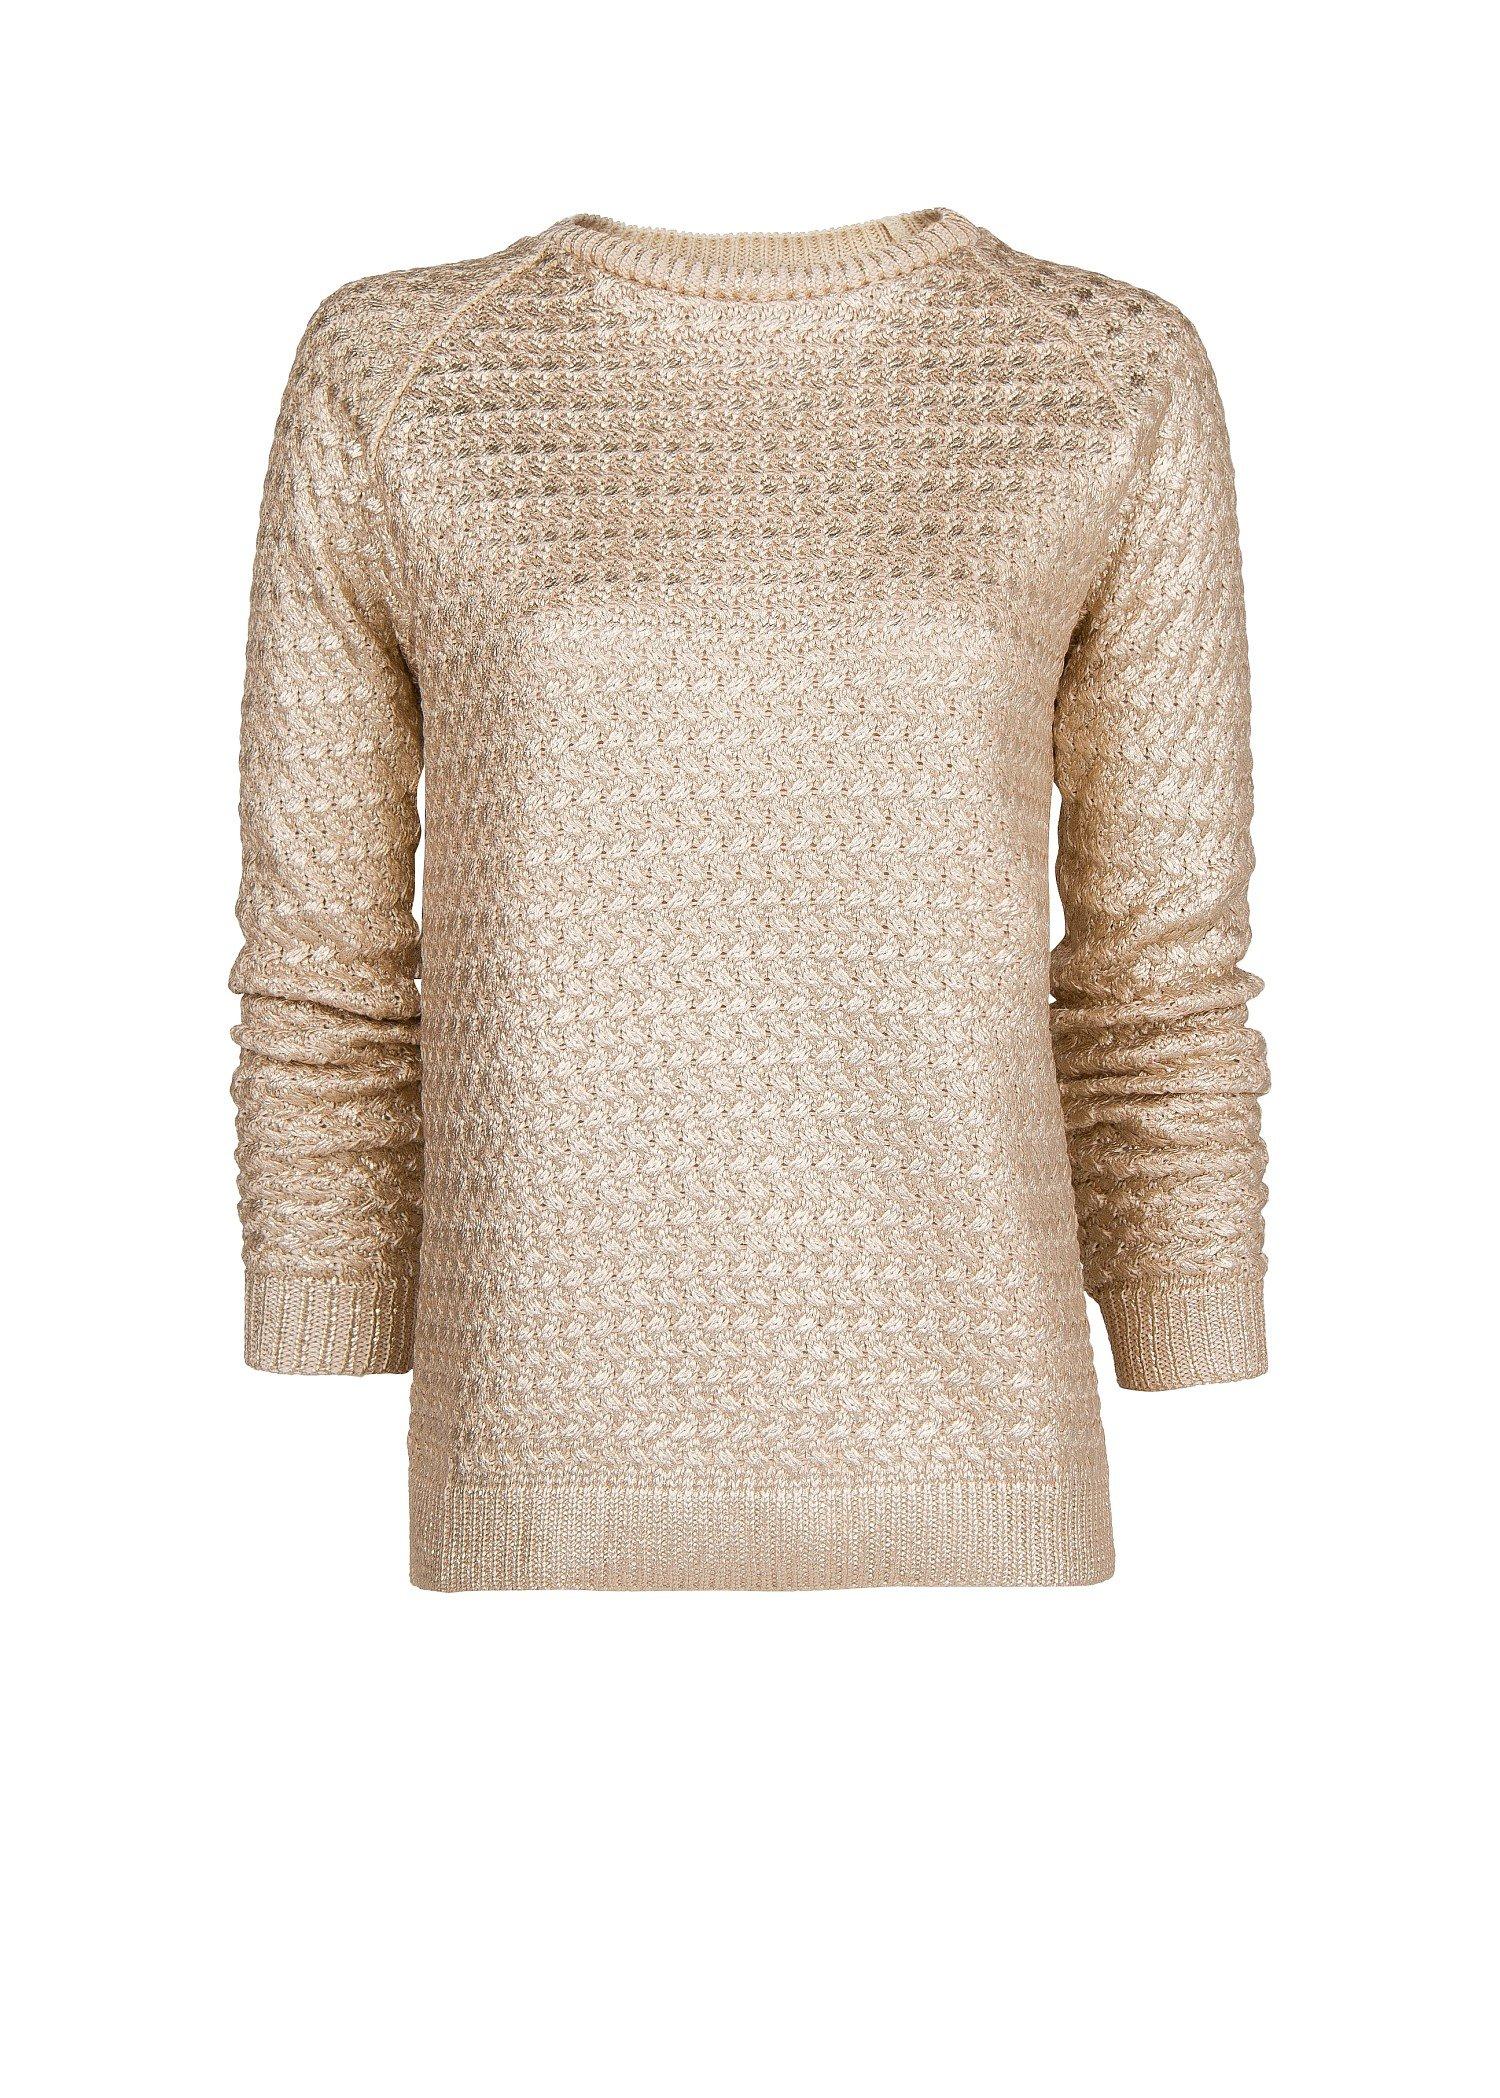 Mango Textured Metallic Sweater in Metallic | Lyst